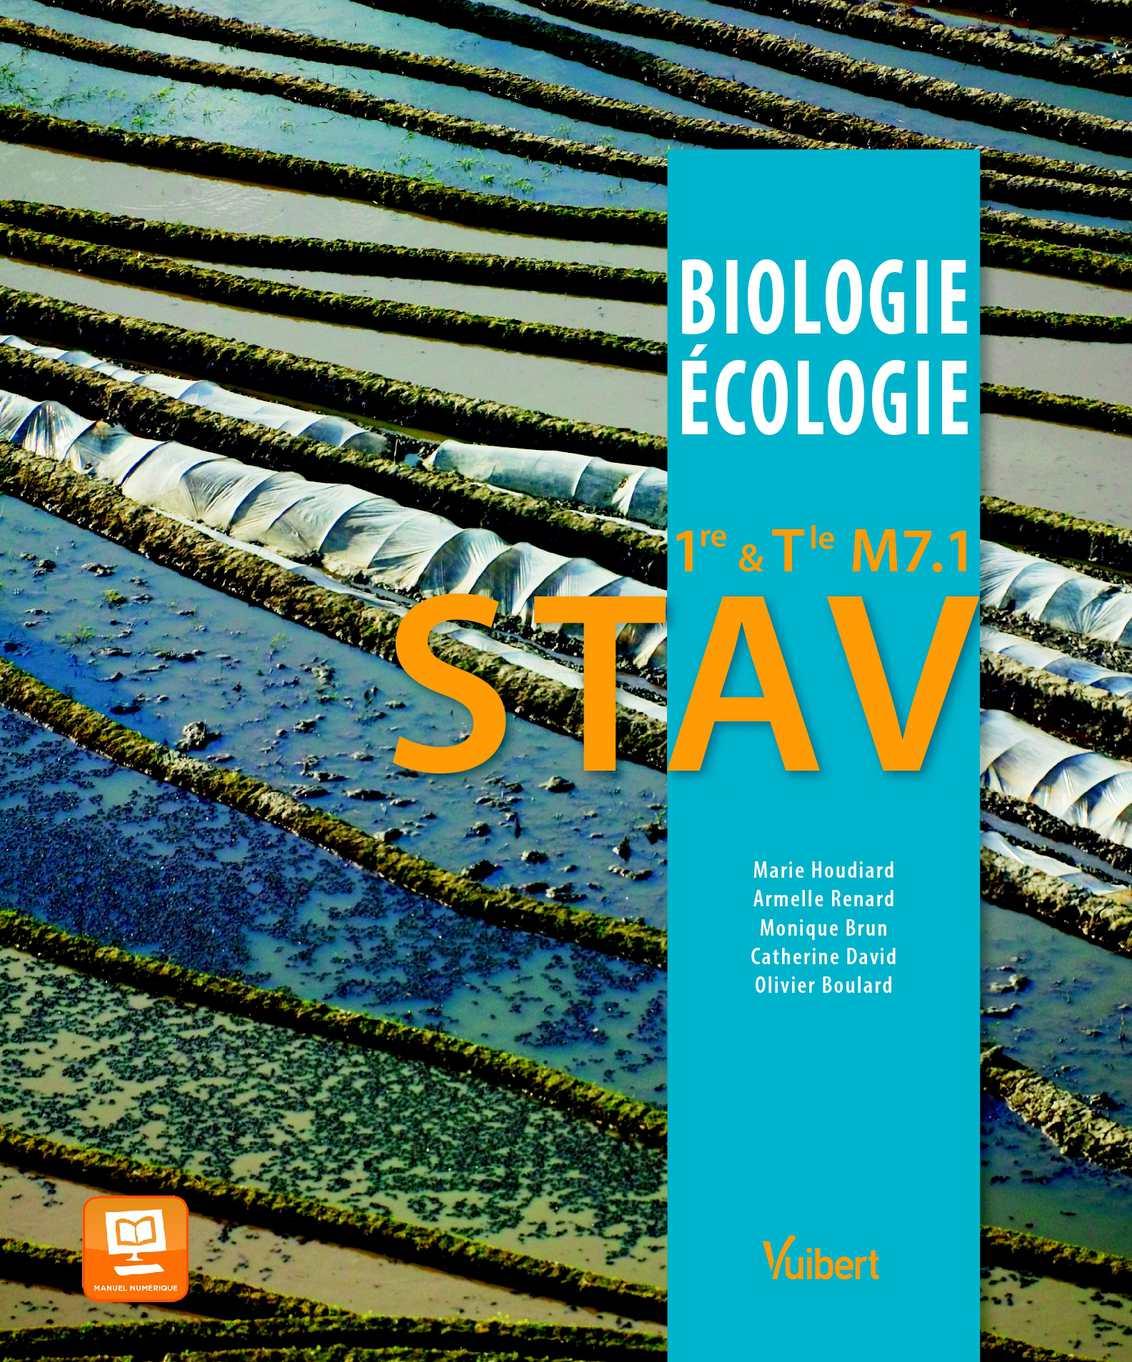 Specimen enseignant - Biologie-Écologie 1re et Tle M7.1 STAV - Vuibert